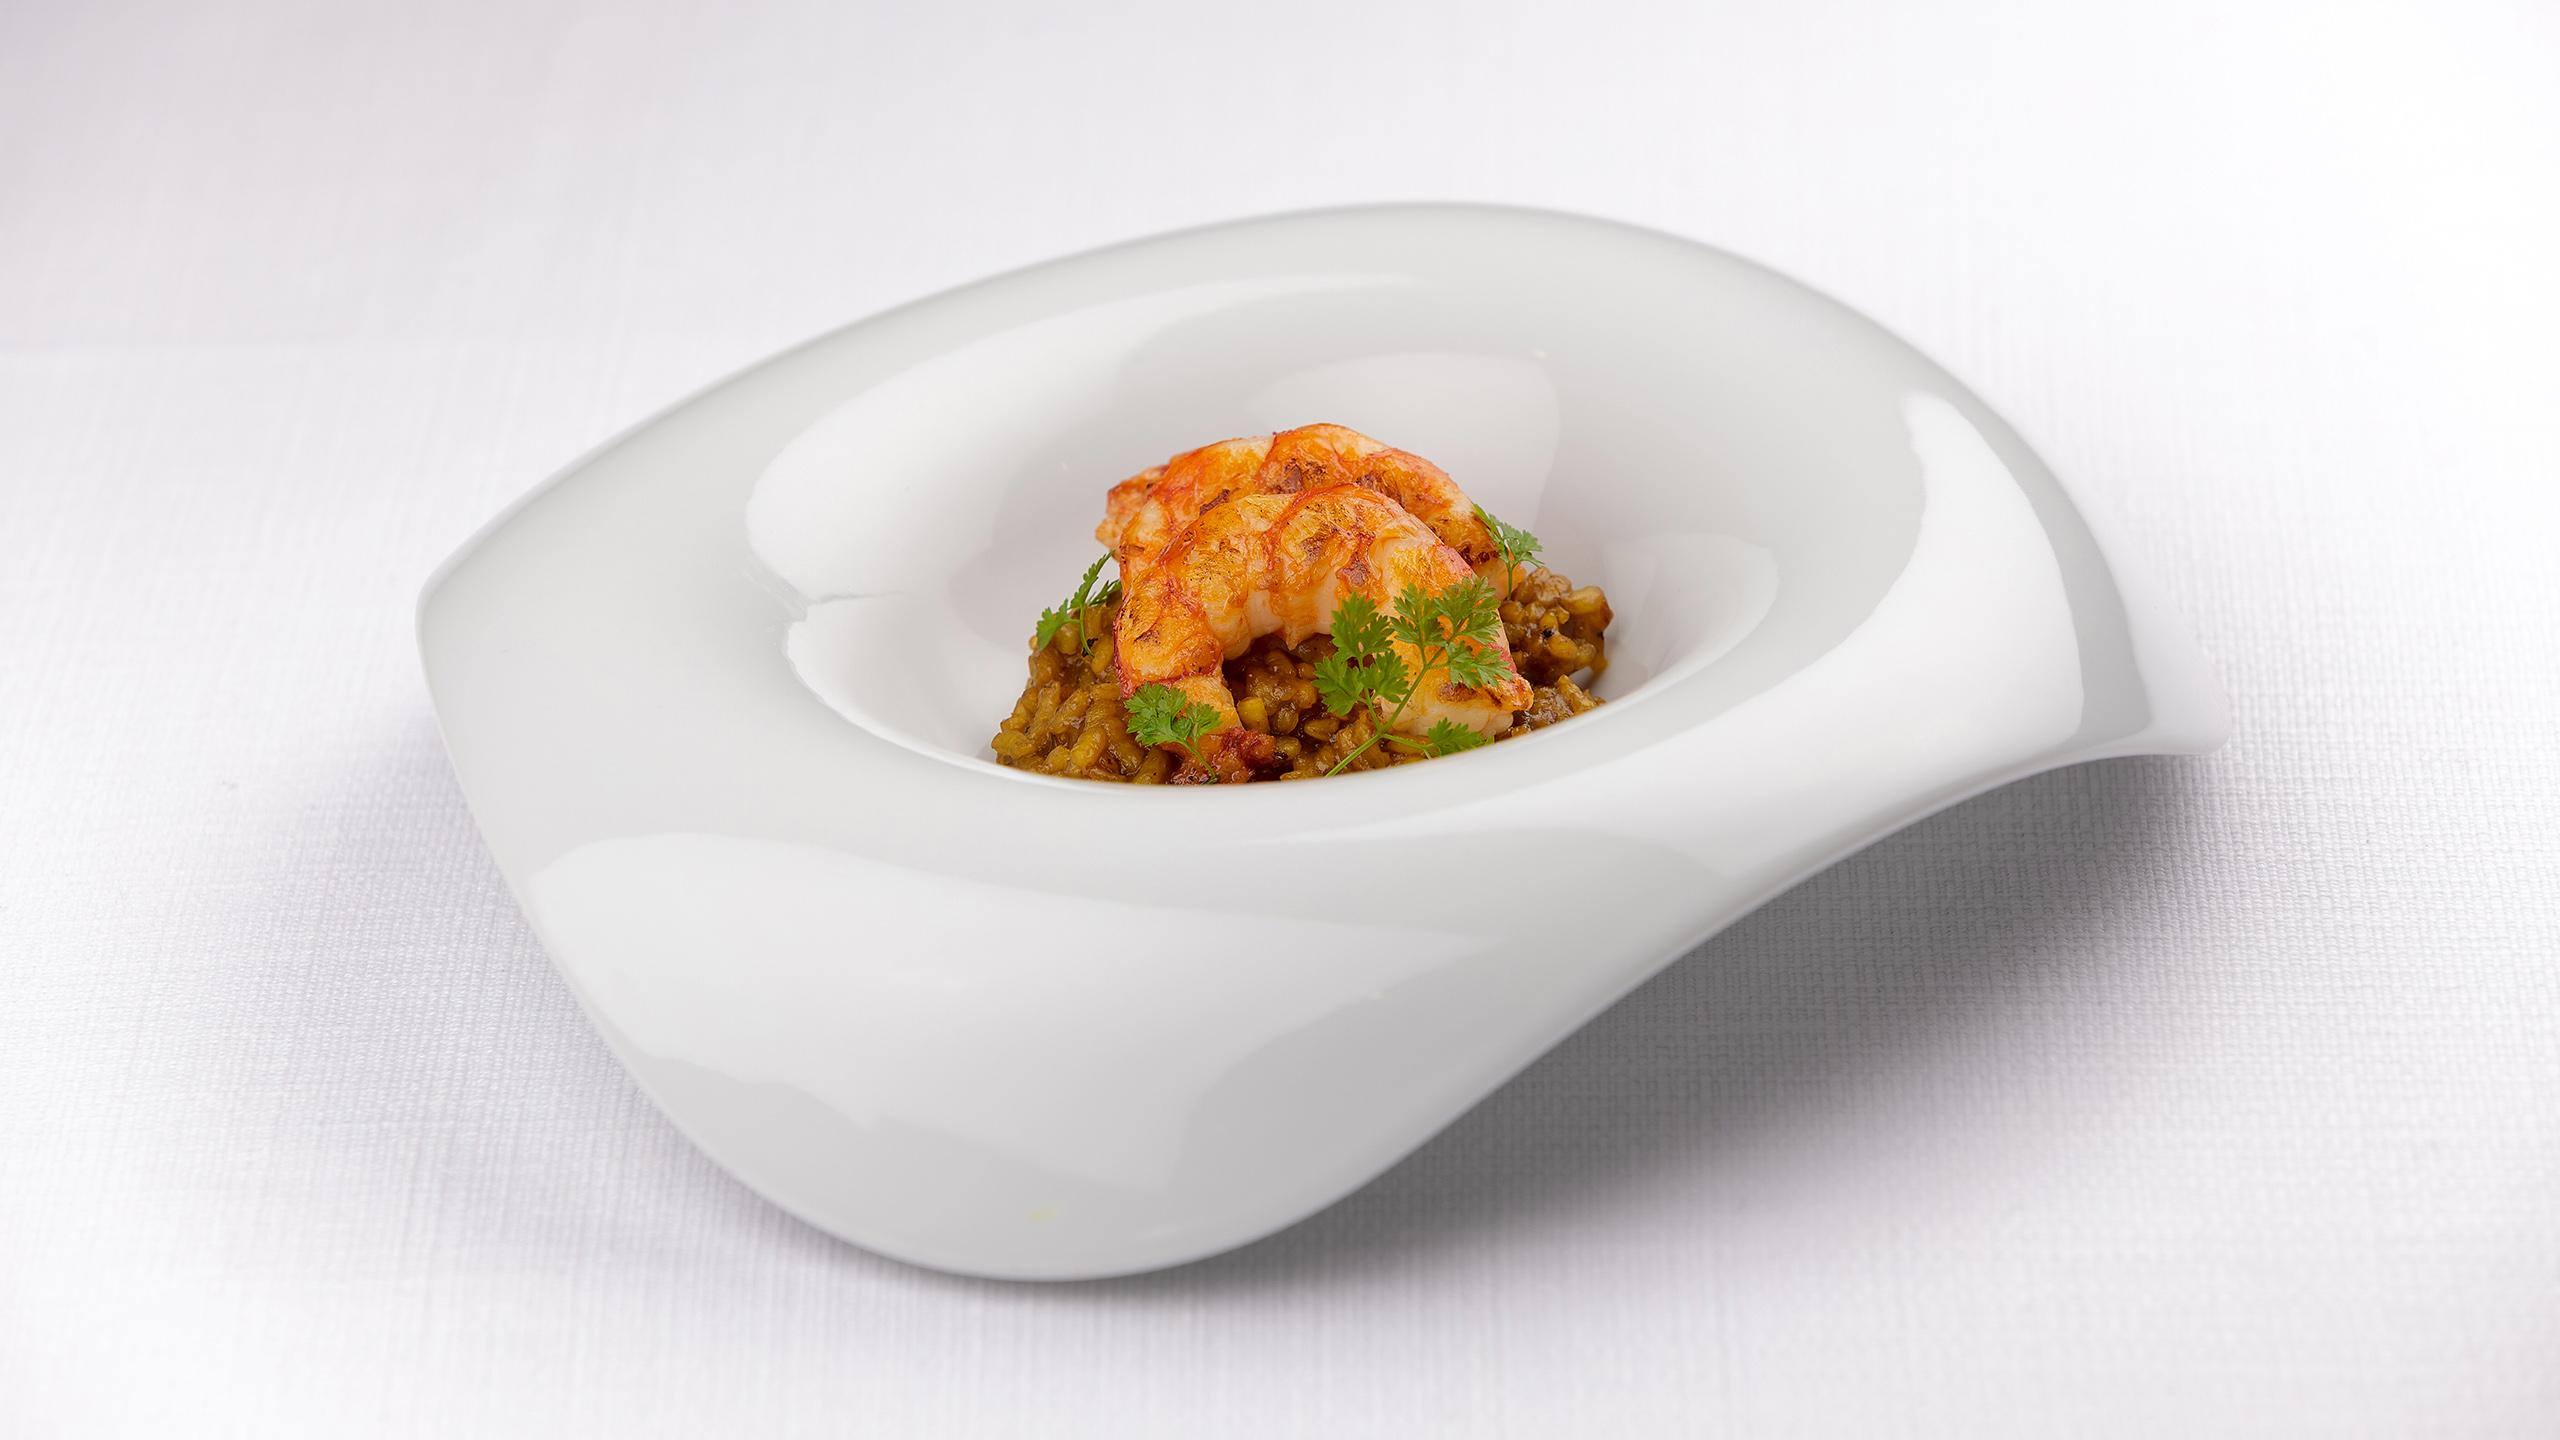 gastronomia 13 profand